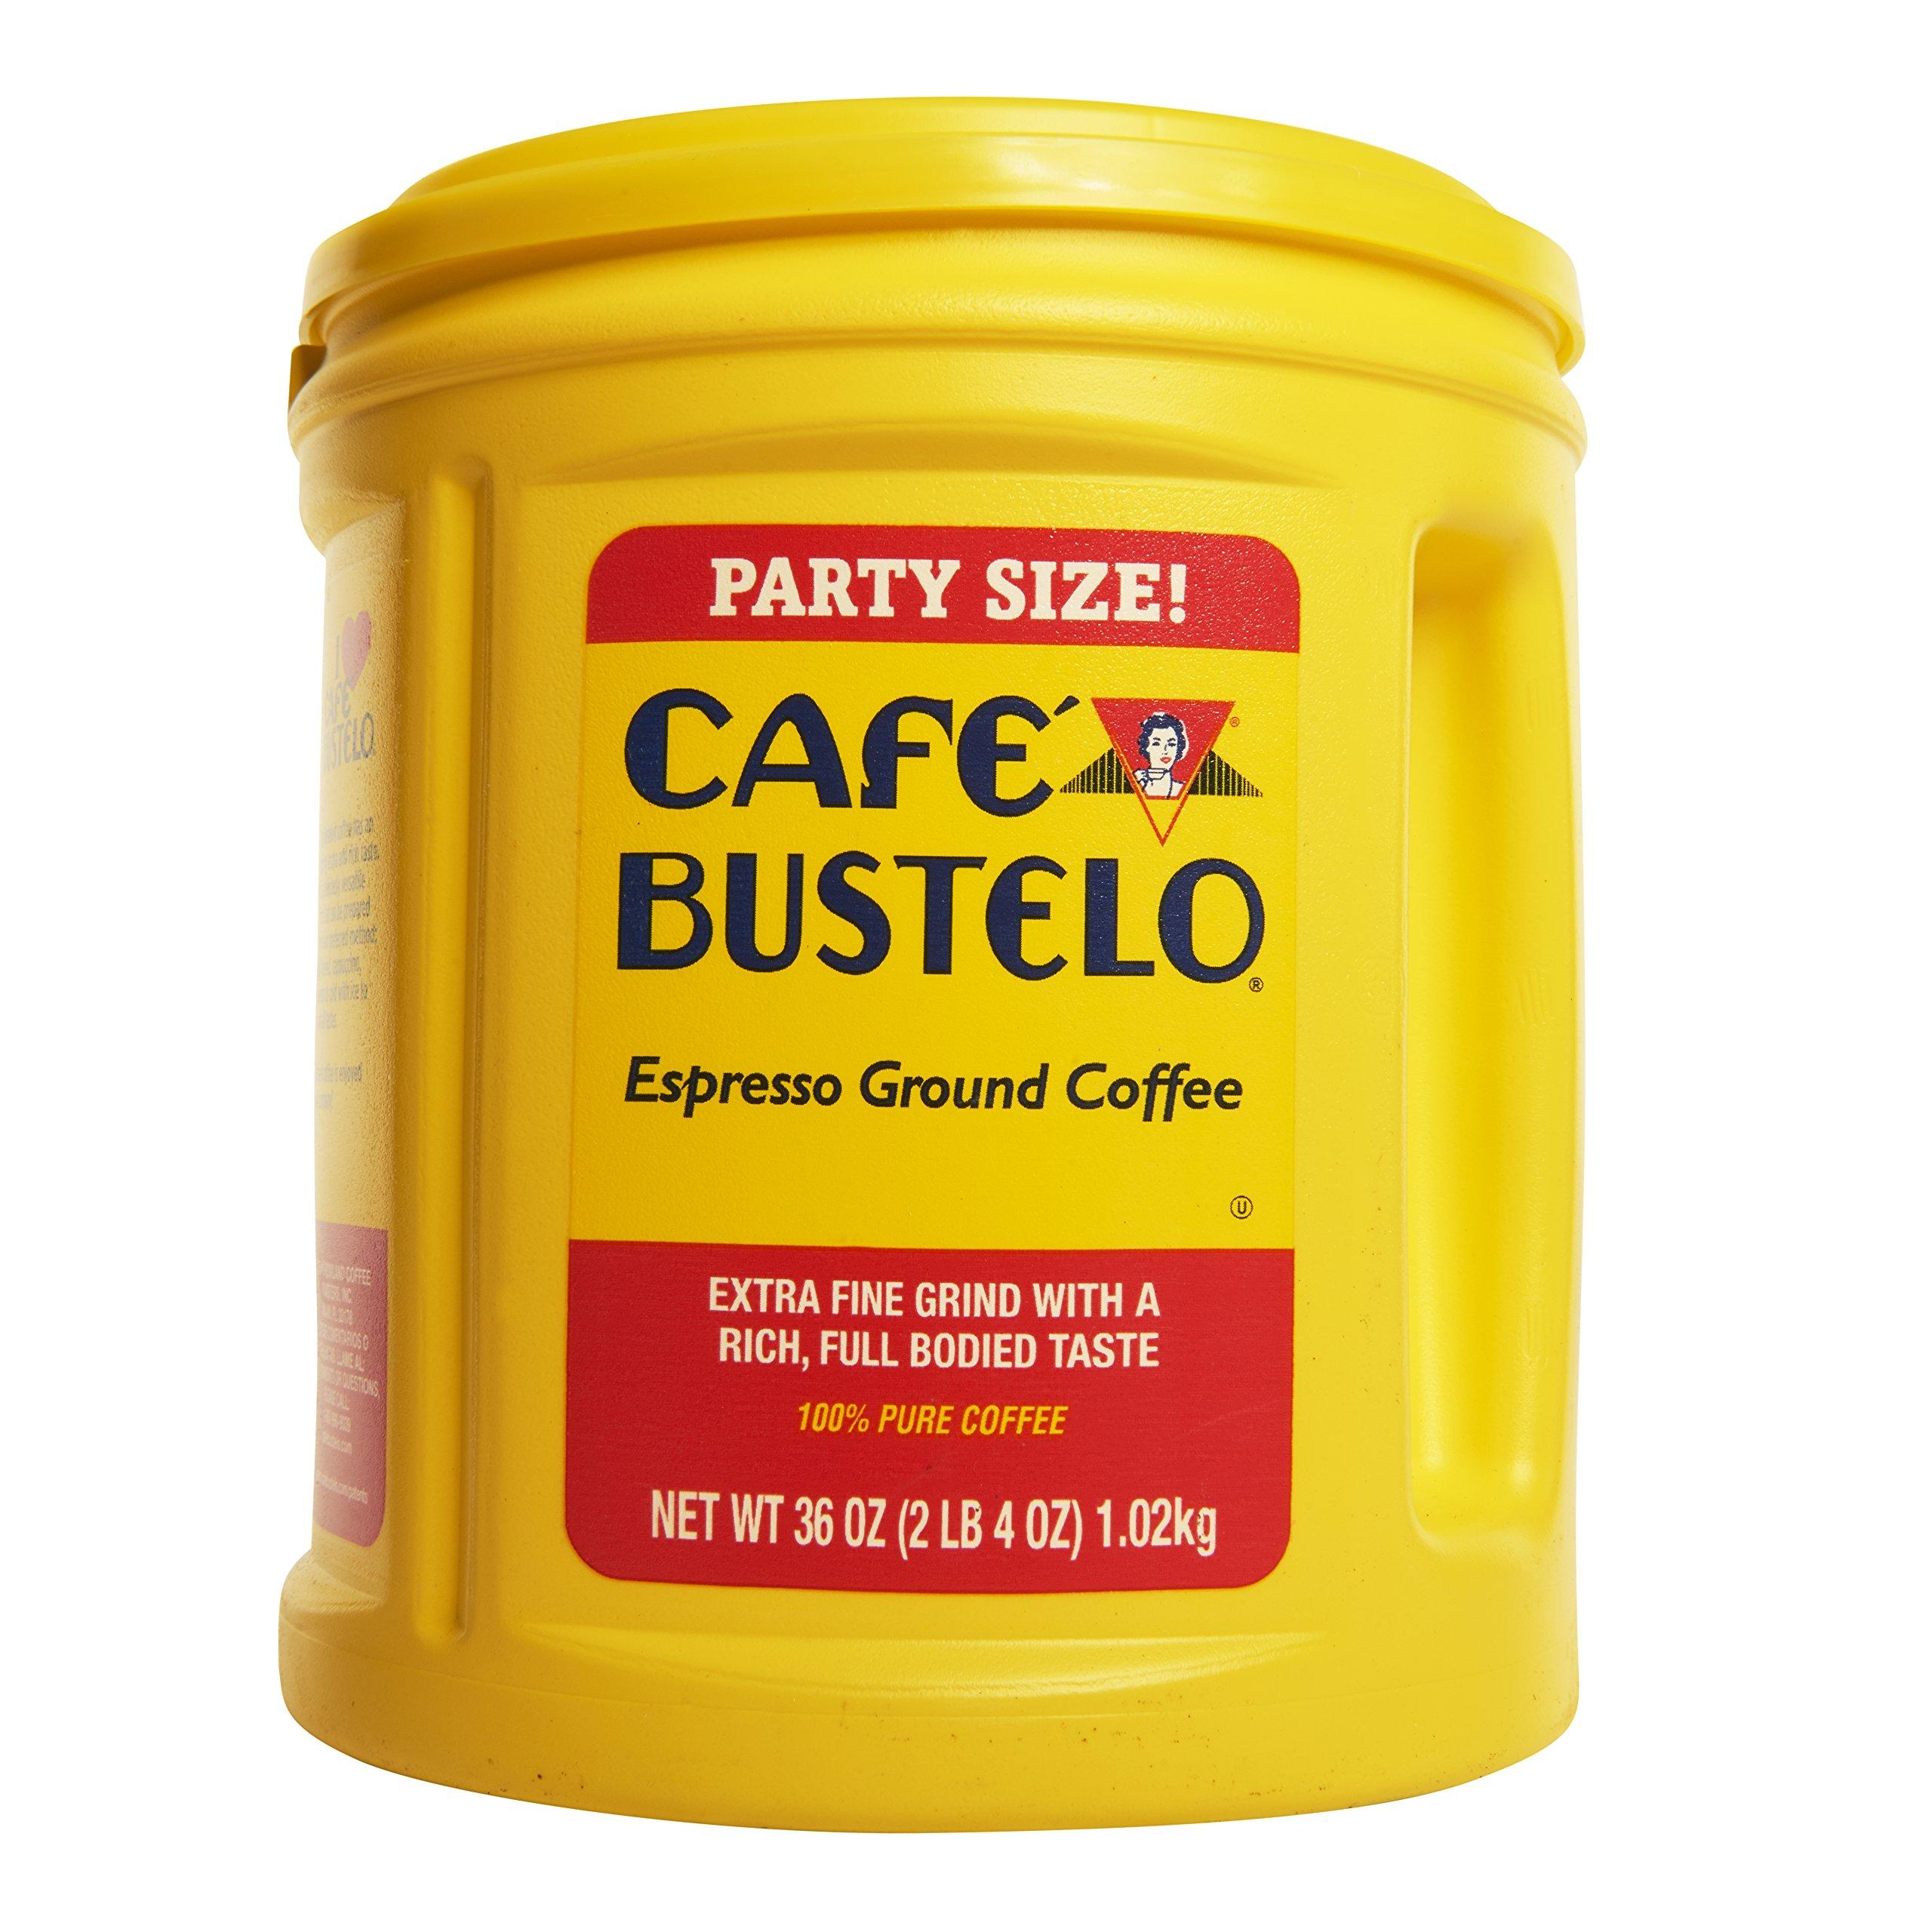 Cafe Bustelo Espresso Ground Coffee, 36oz Canister